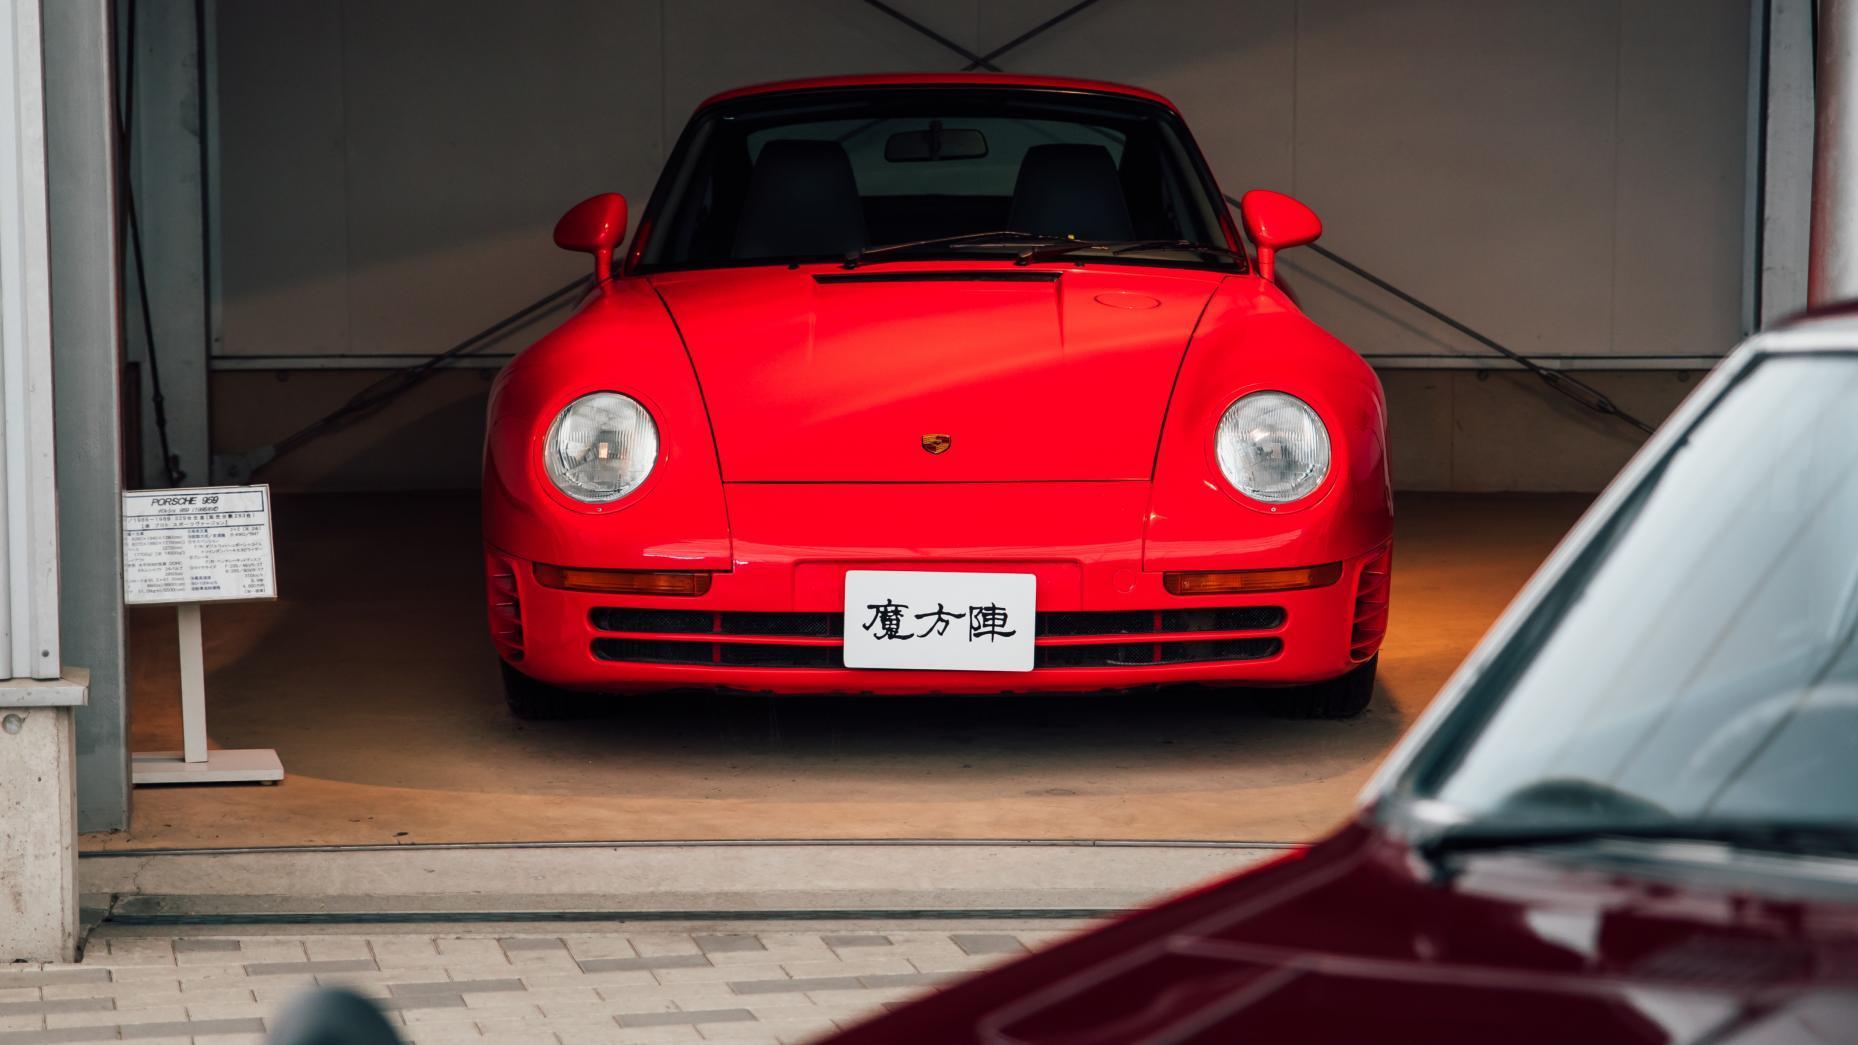 Vette auto's in Japan